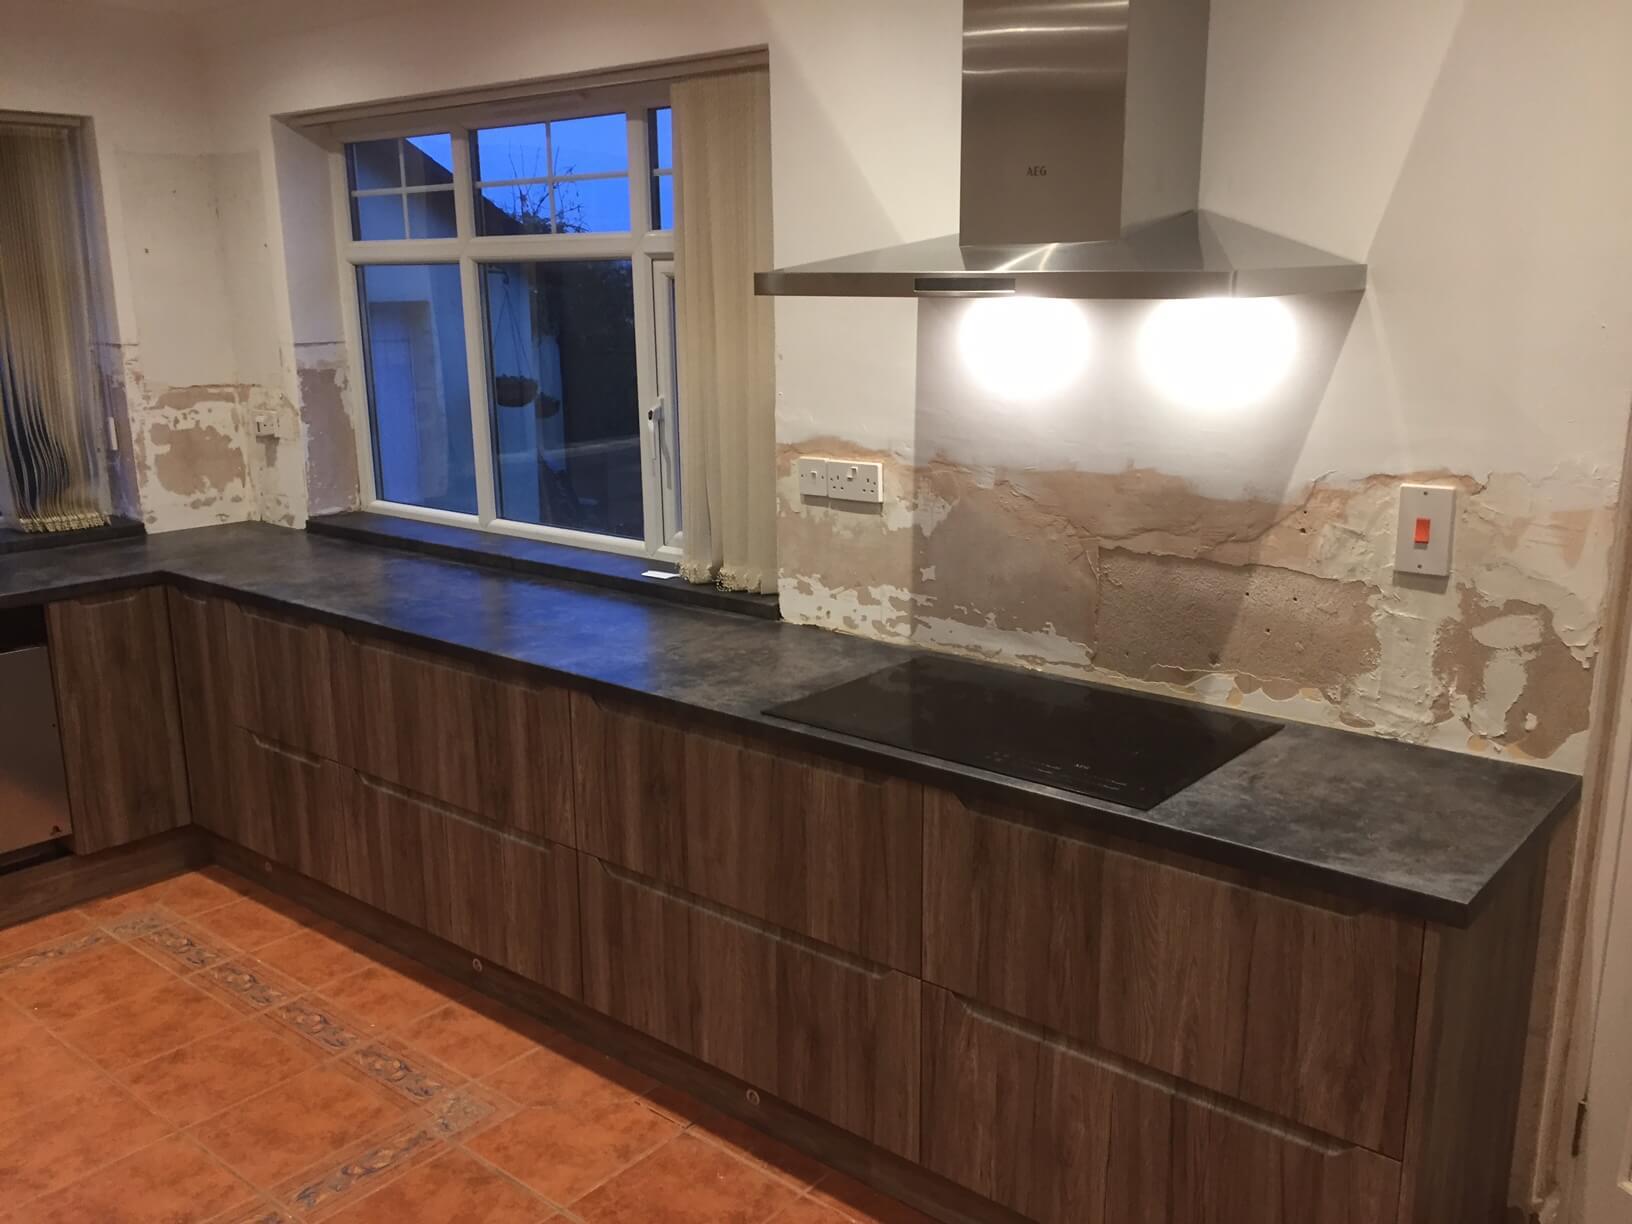 Finished Kitchen worktops